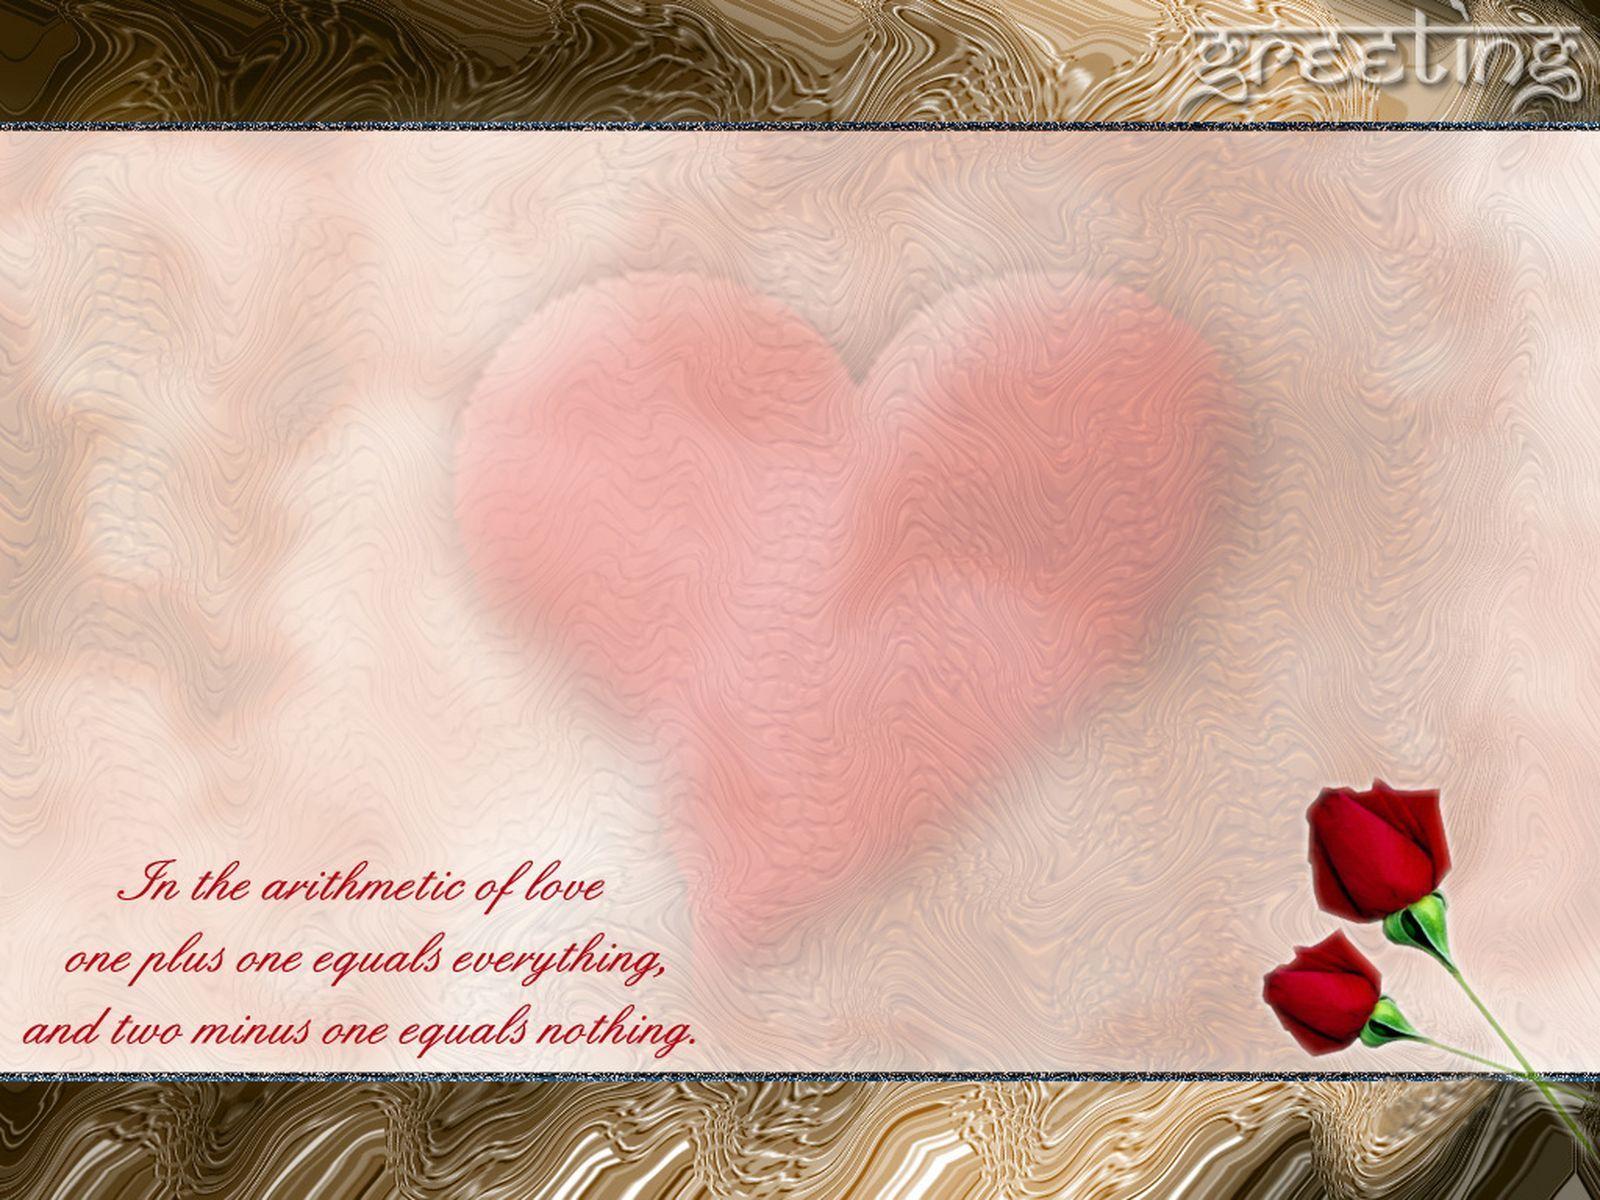 http://4.bp.blogspot.com/-BCj_l_T4Wvw/Ttno-N5GaDI/AAAAAAAAAt0/LTbhtFAXERg/s1600/Love-Wallpaper-love+picture.jpg